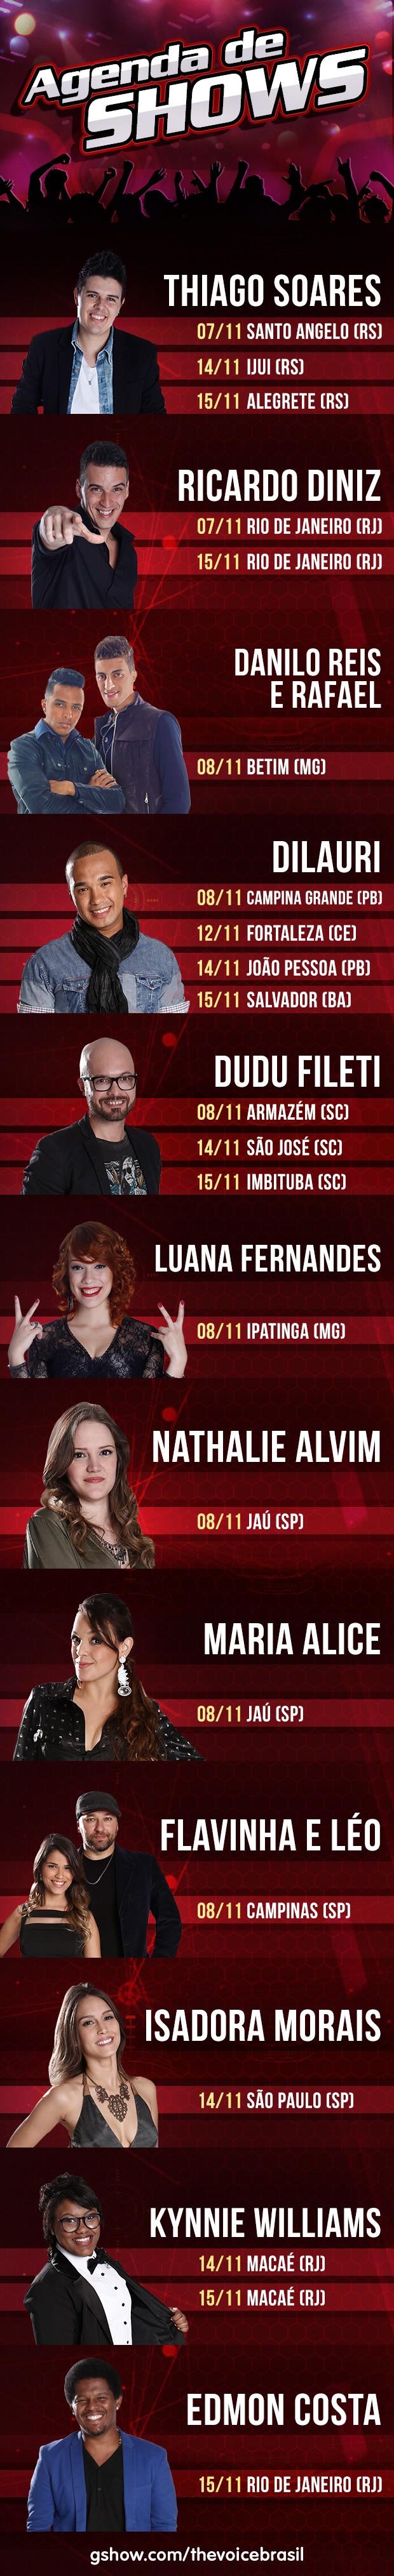 Agenda de shows vale este (Foto: The Voice Brasil)